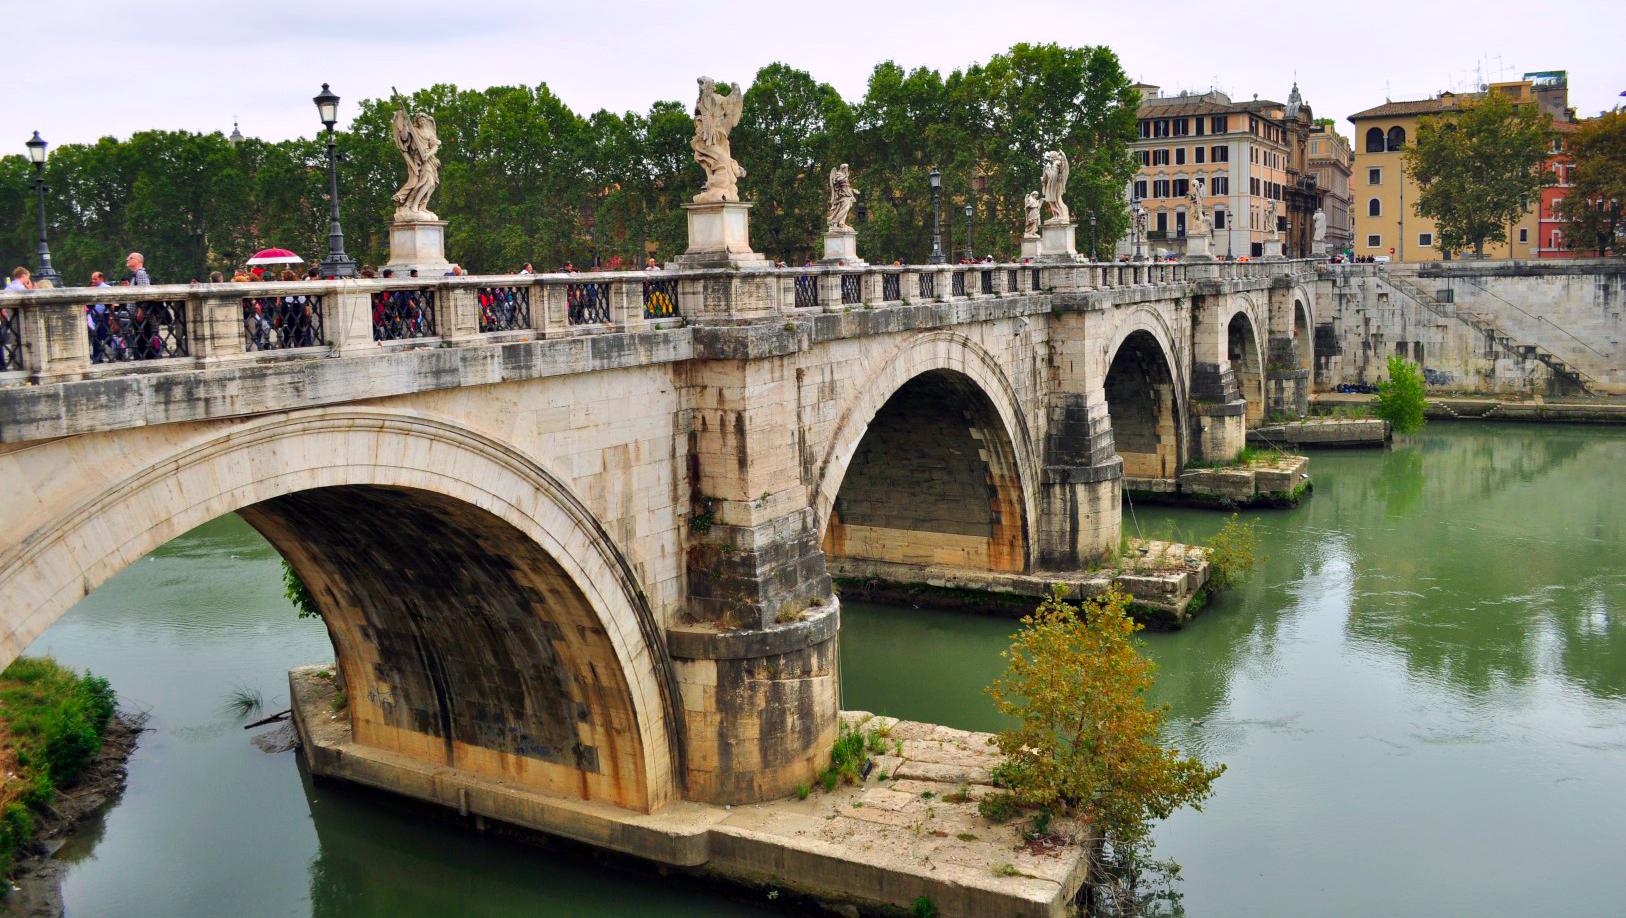 Cosas que ver gratis en Roma, Italia roma - 29324048243 6bfdac8cbb o - 21+1 Cosas que NO hacer en Roma, Italia